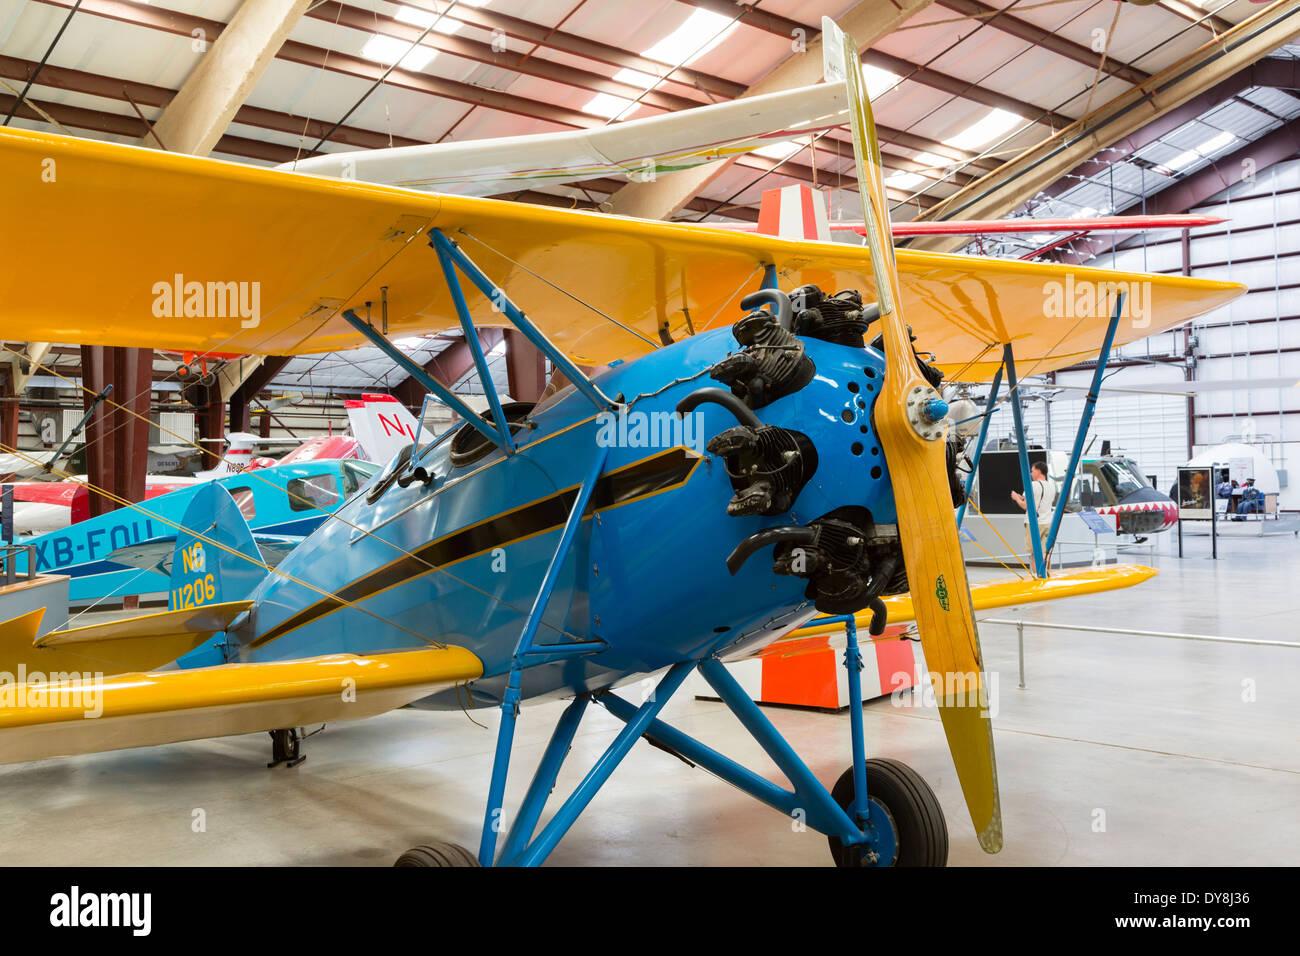 USA, Arizona, Tucson, Pima Air and Space Museum, Waco RNF, civil bi-plane. - Stock Image